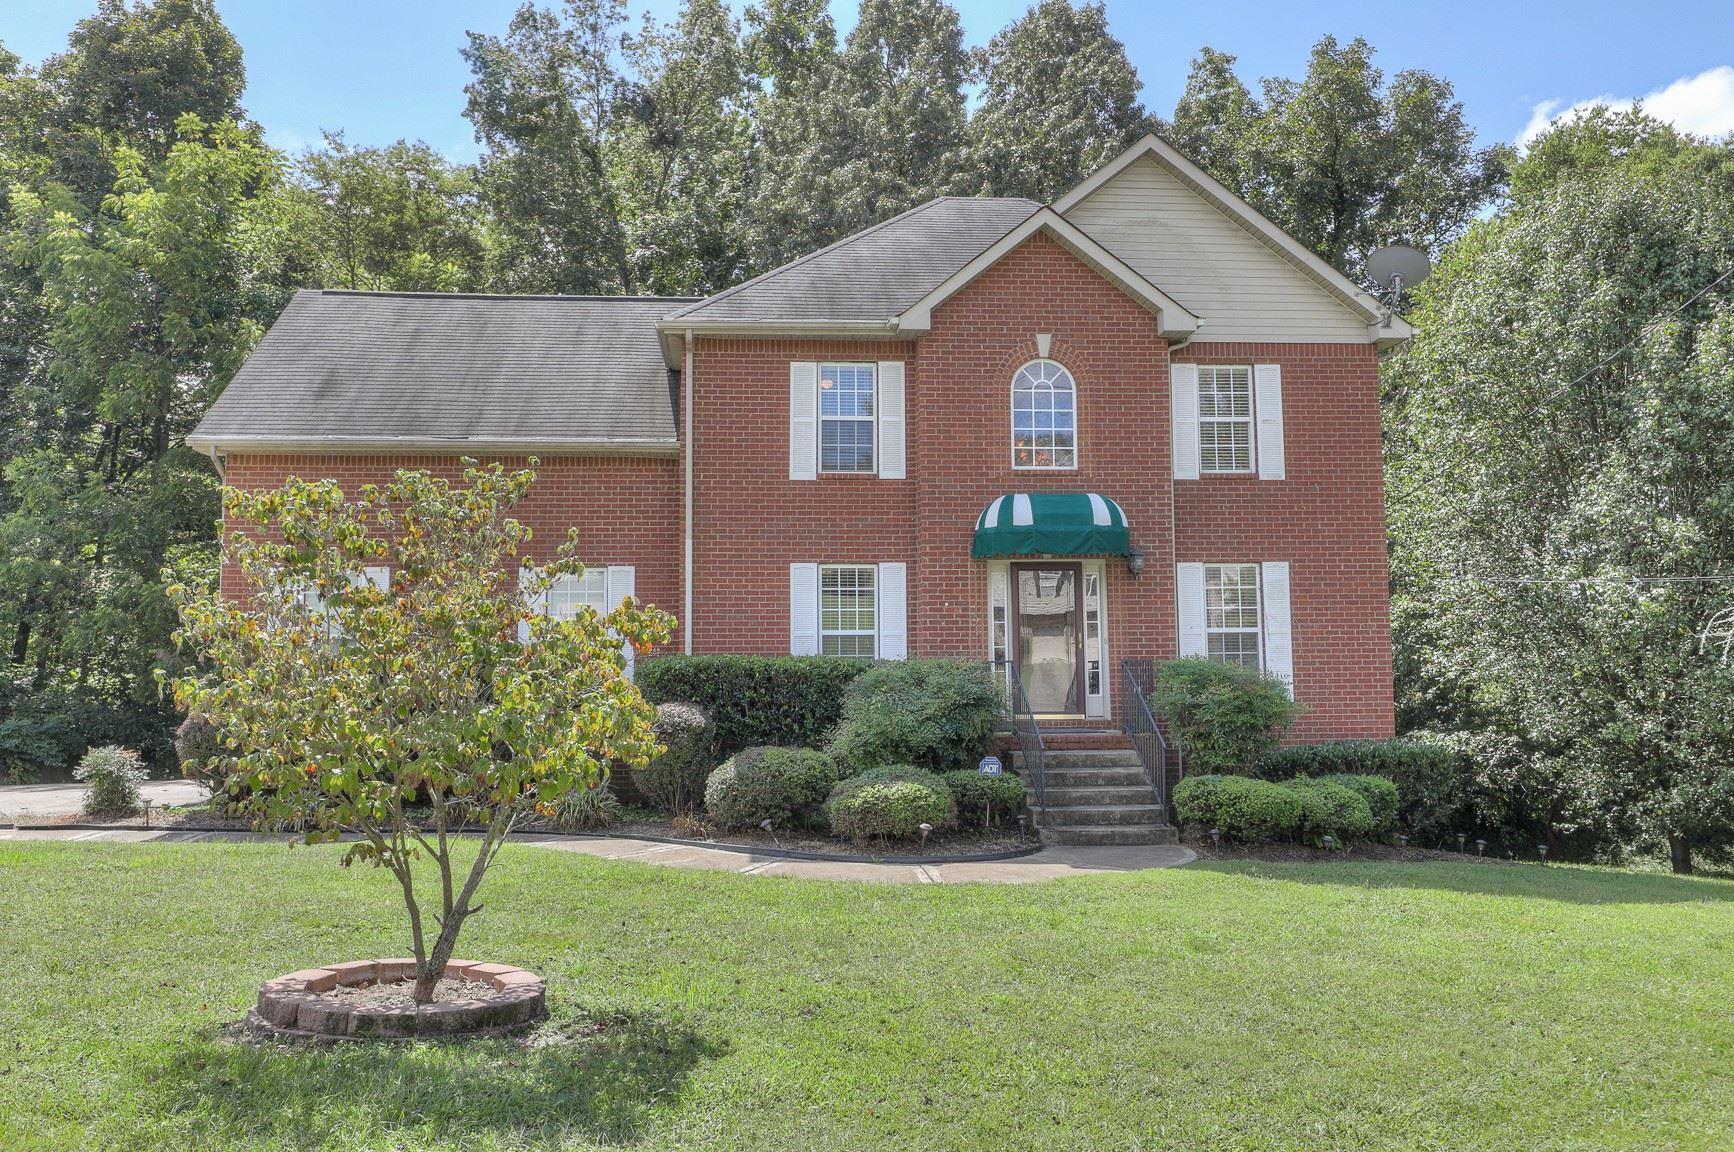 1517 White Pine Ct, Nashville, TN 37214 - MLS#: 2291844